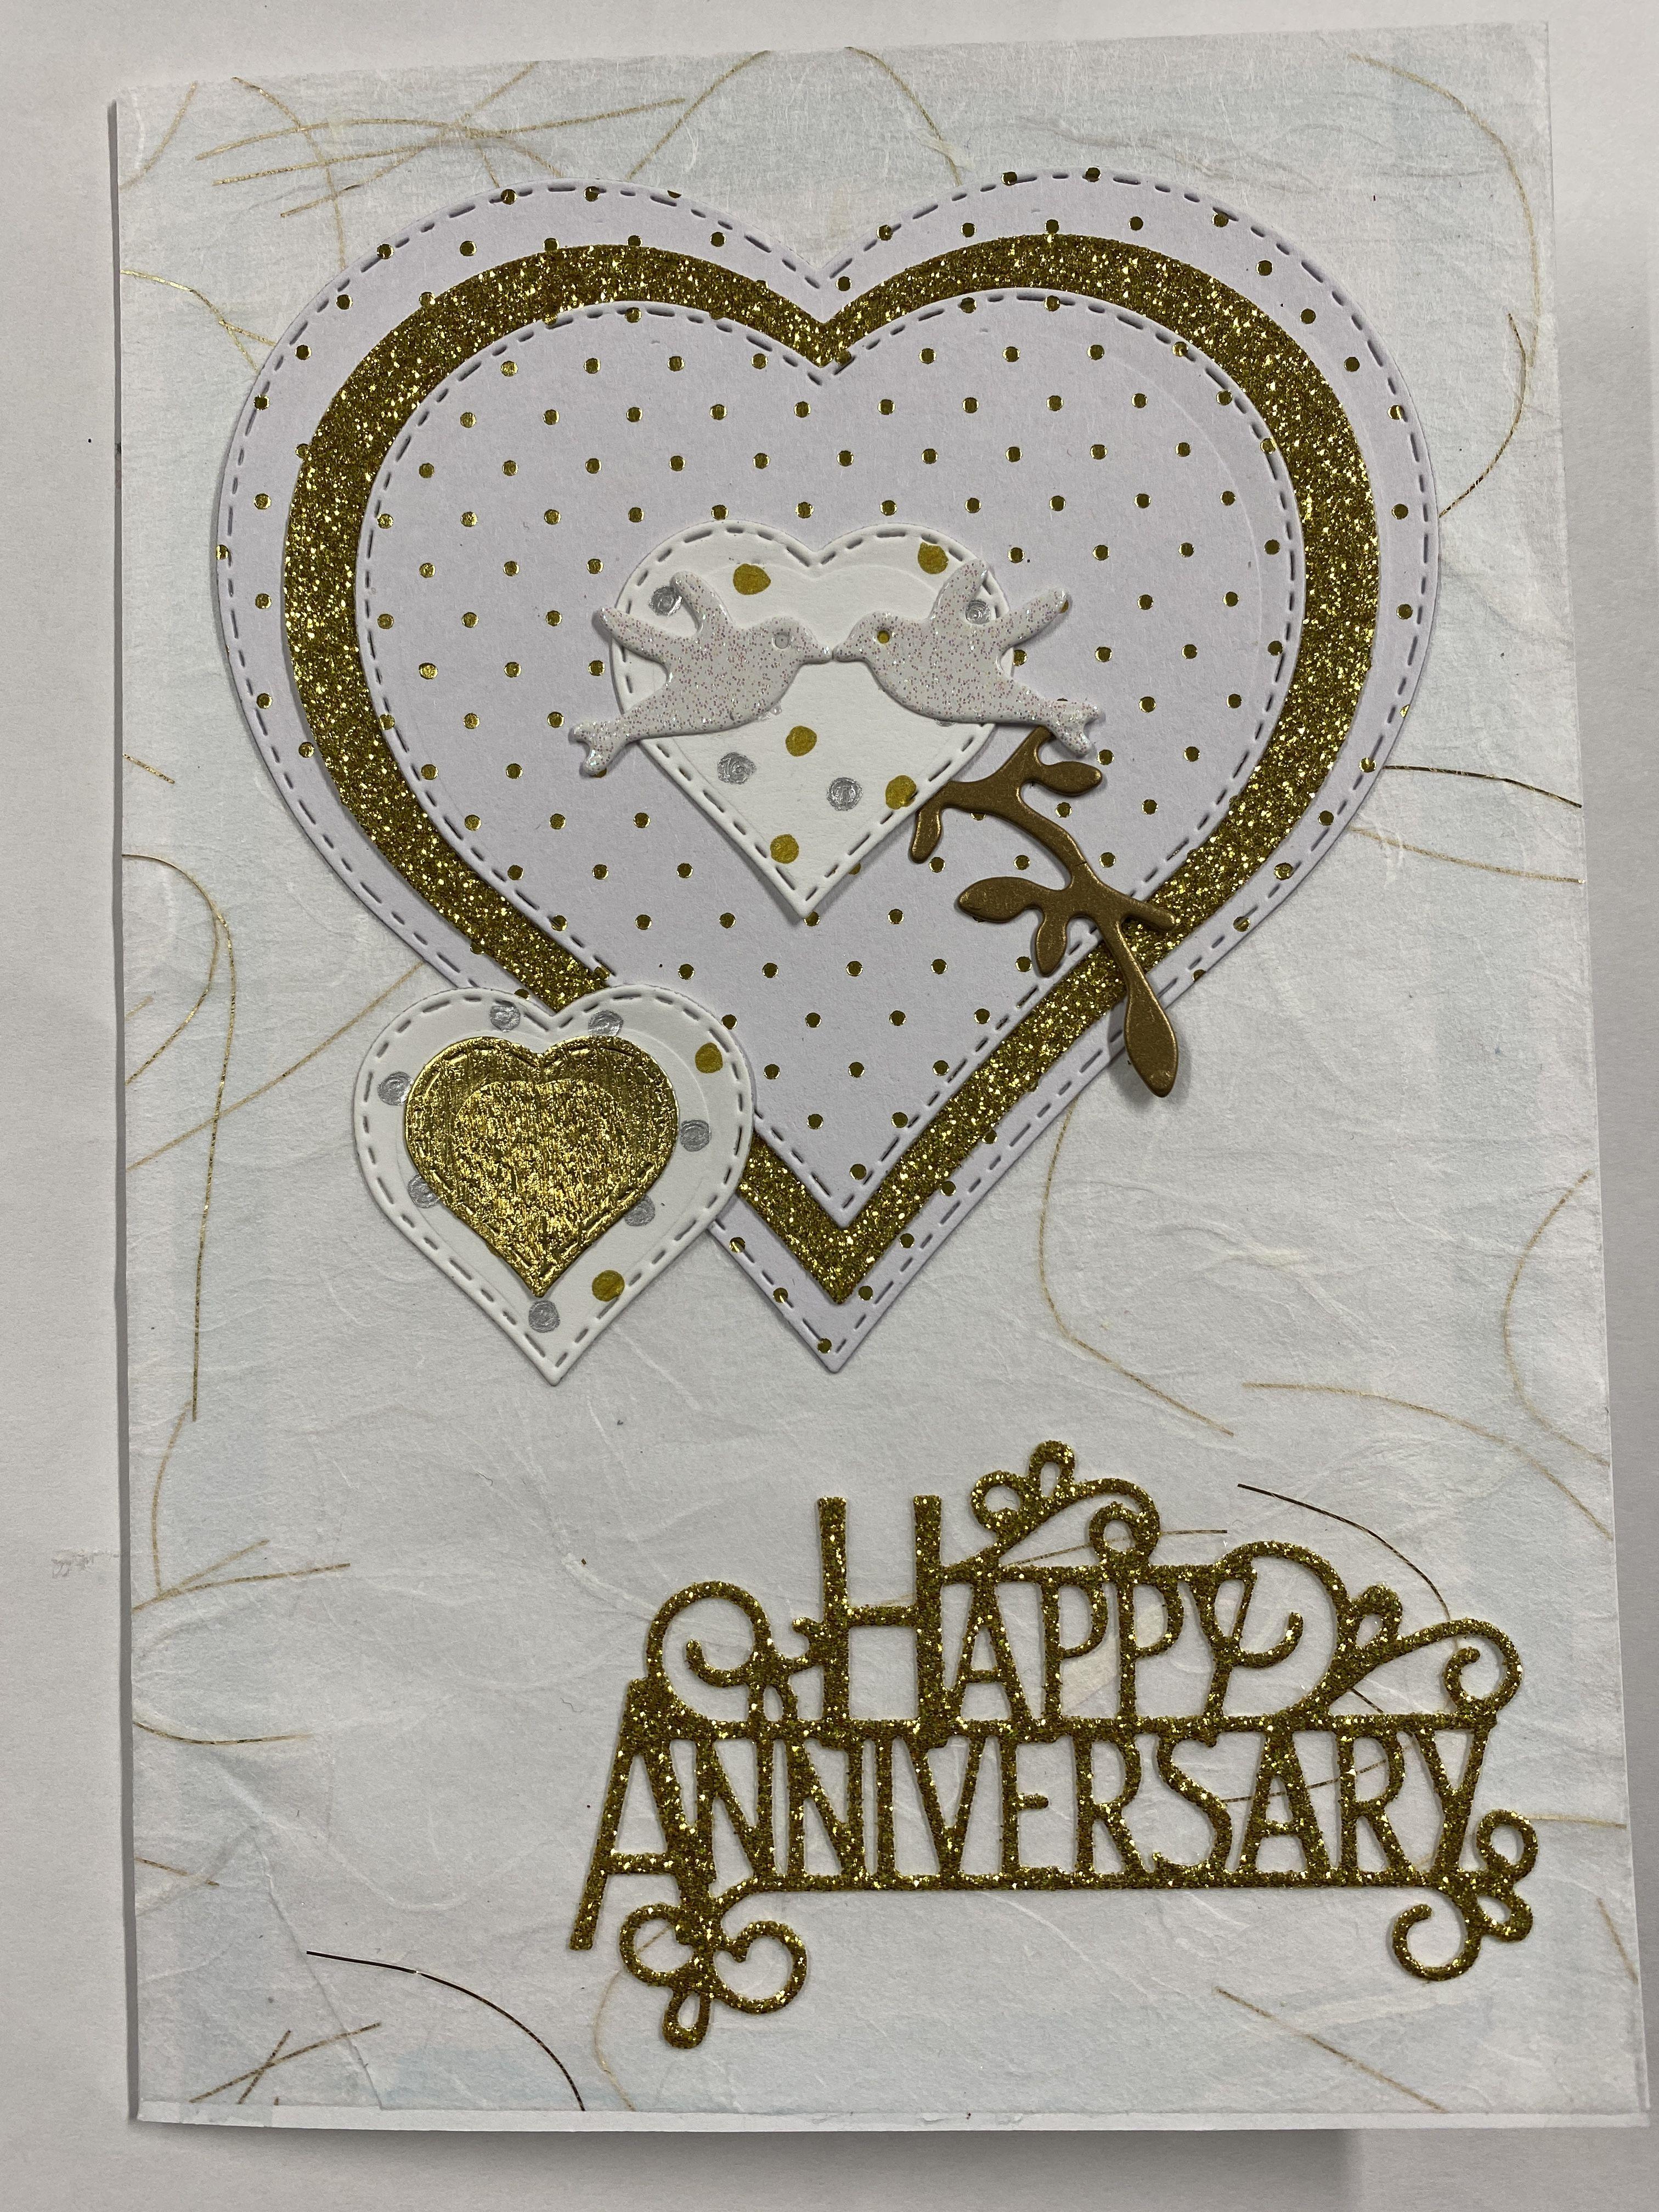 Wedding Anniversary Cards Handmade Hands On Africa You Choose Design Ebay Wedding Anniversary Cards Anniversary Cards Cards Handmade